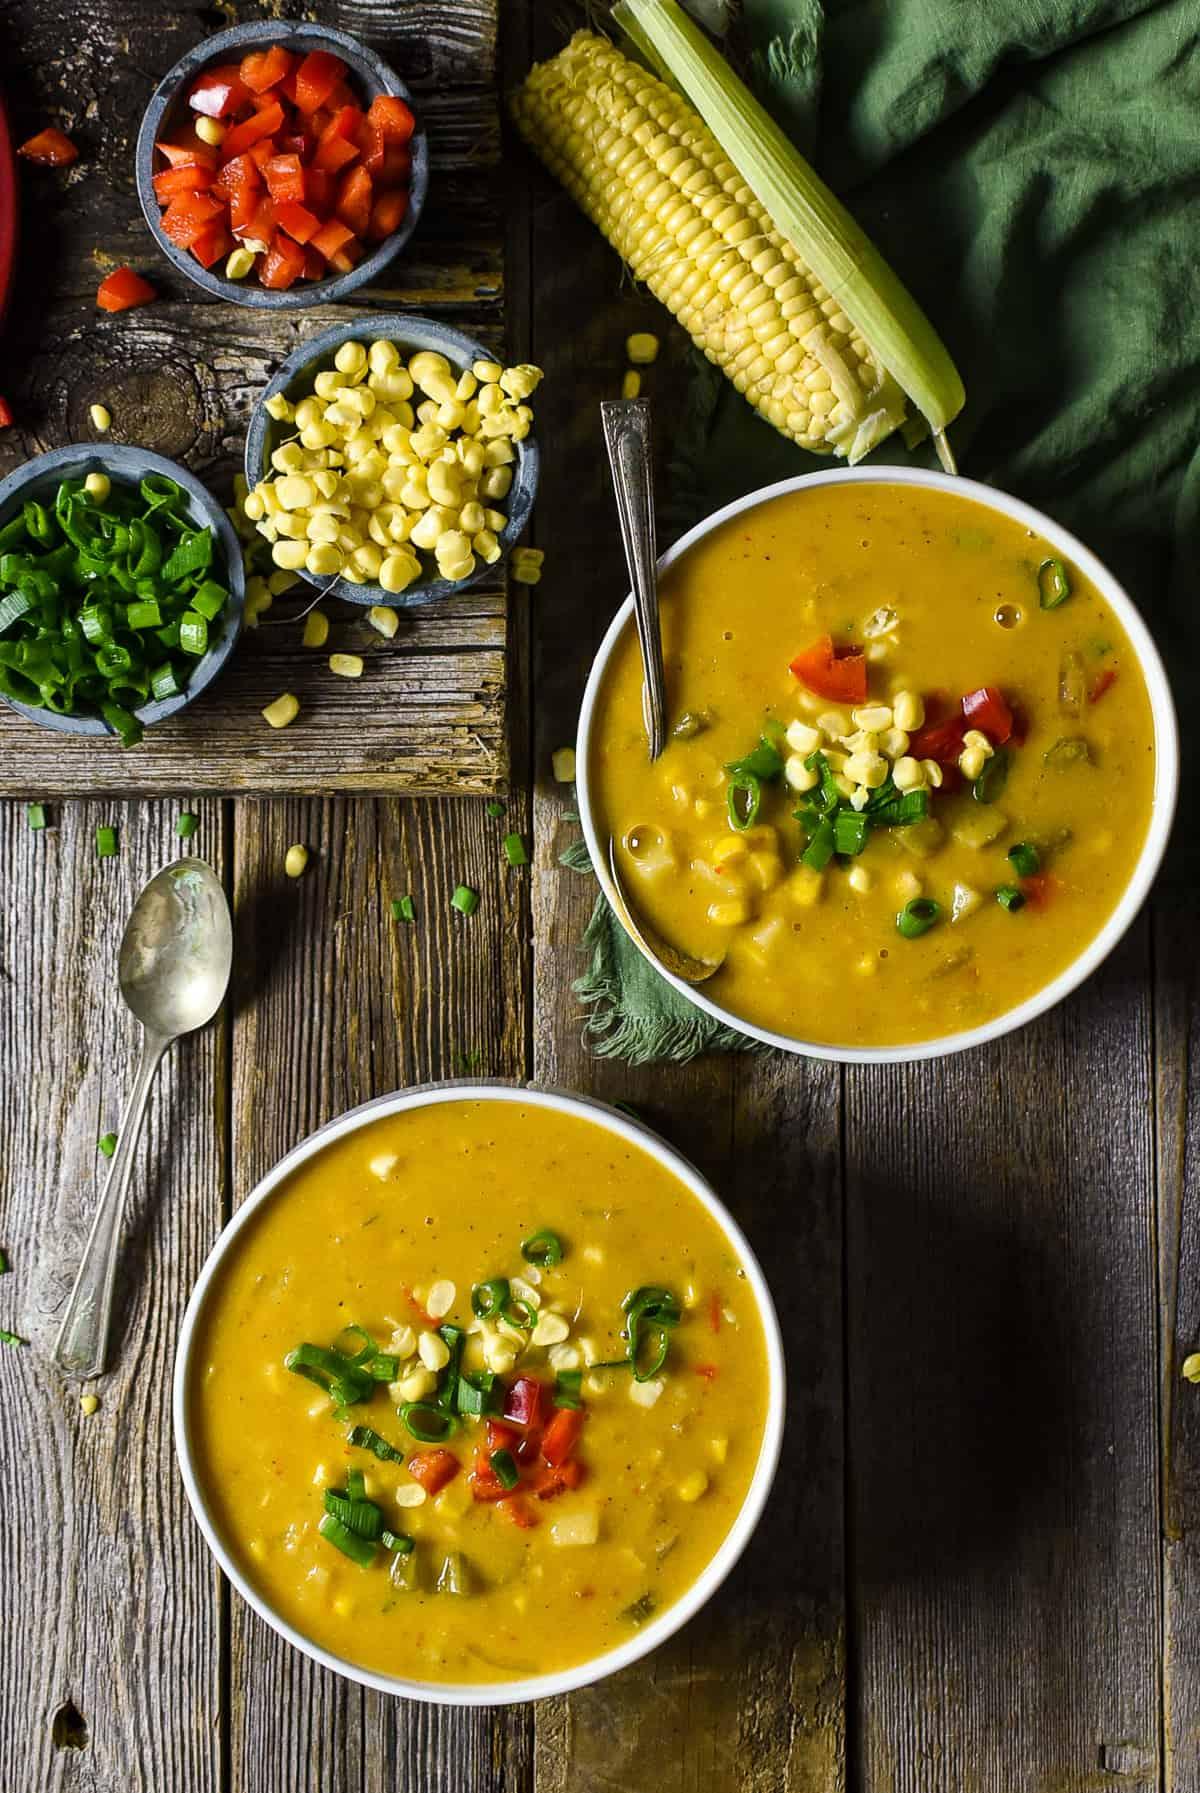 Two bowls of vegan corn chowder.